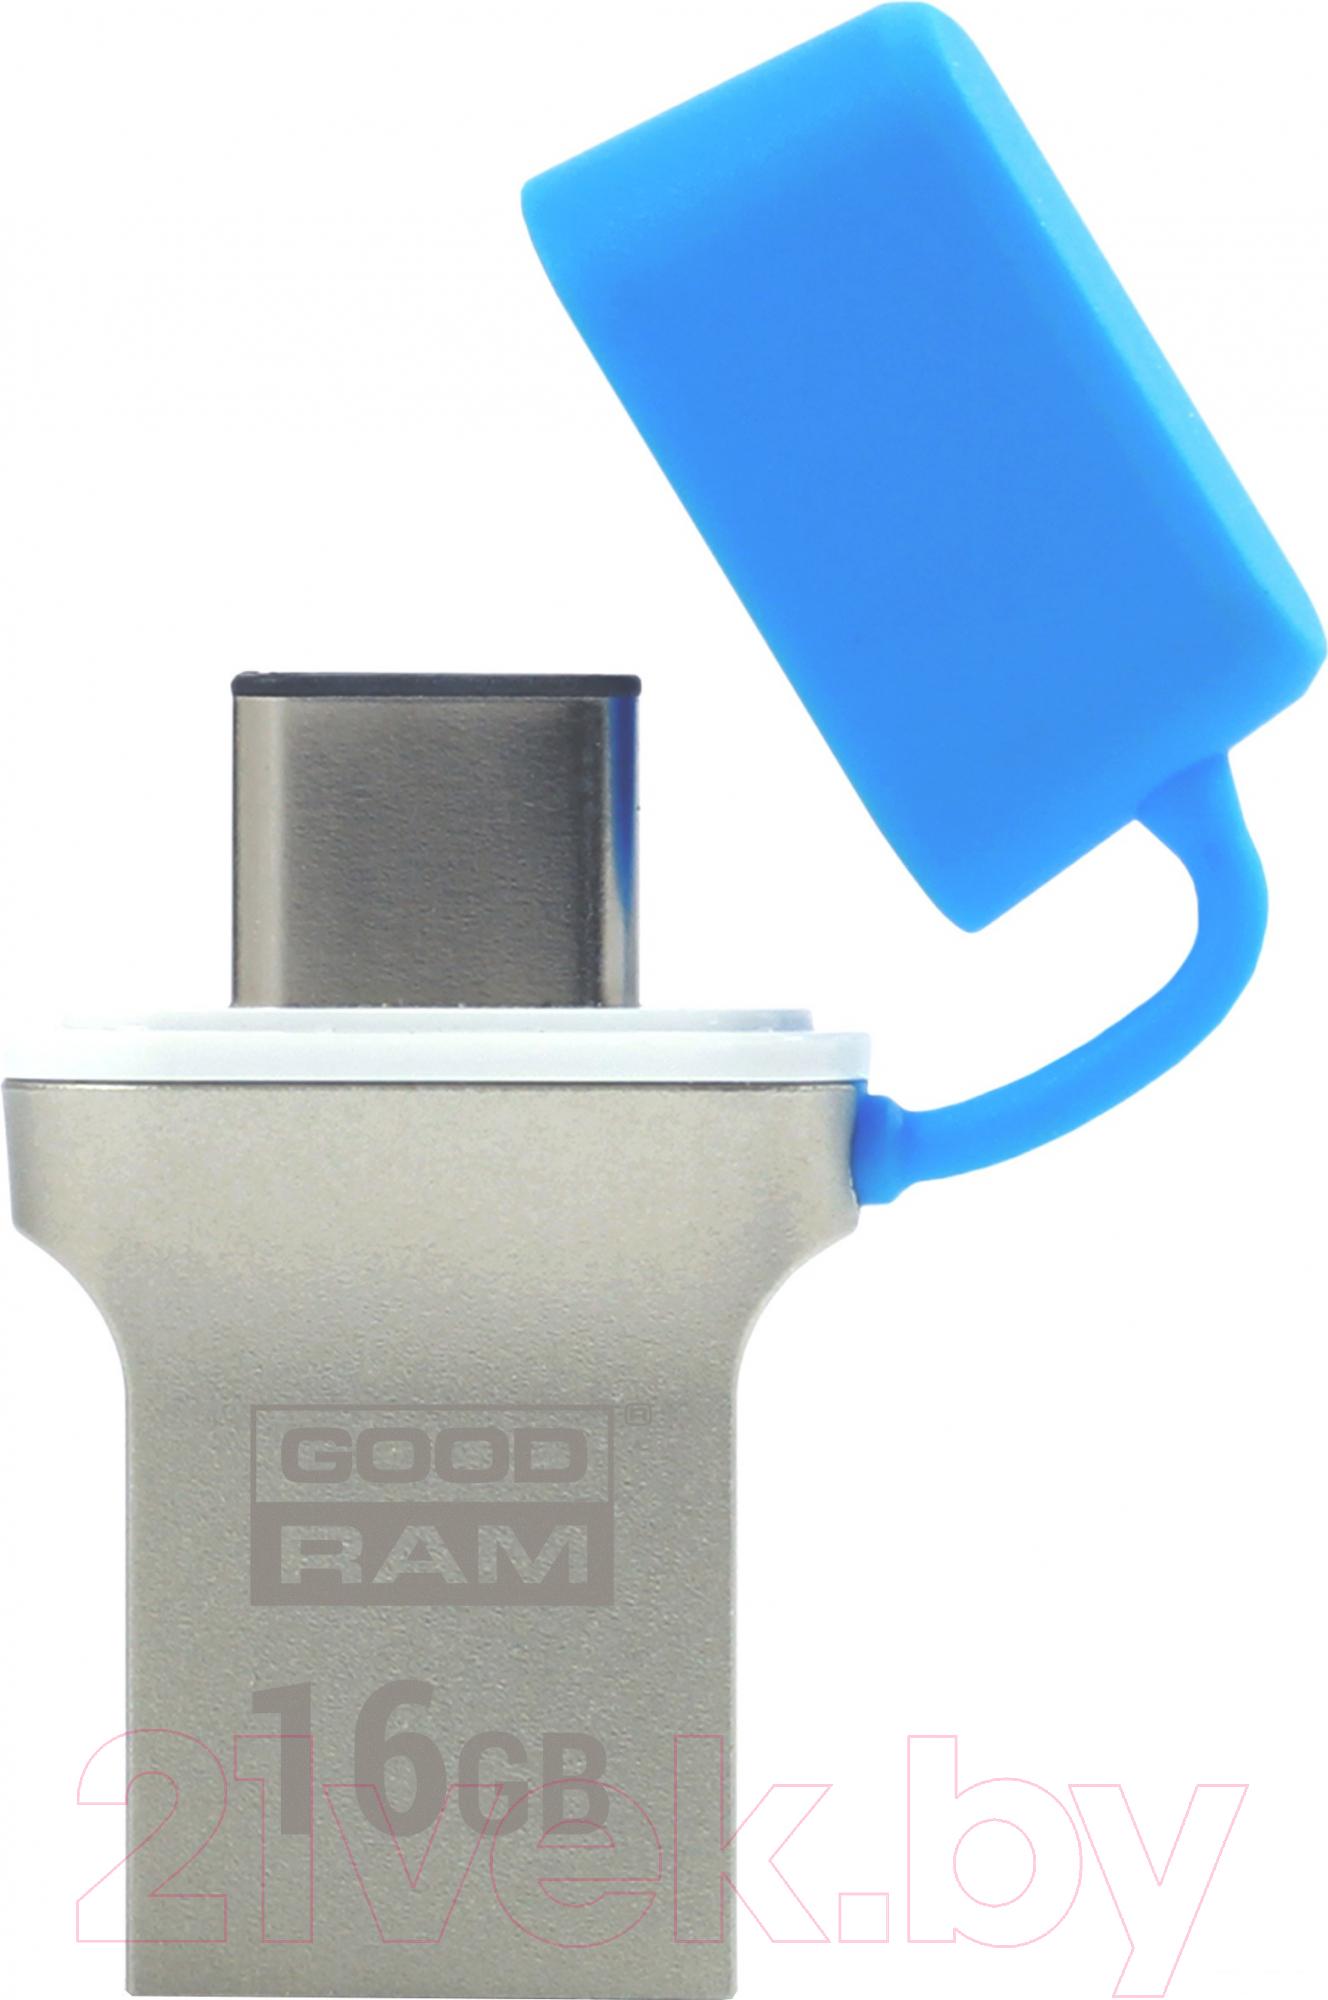 Купить Usb flash накопитель Goodram, ODD3 16GB Blue (ODD3-0160B0R11), Китай